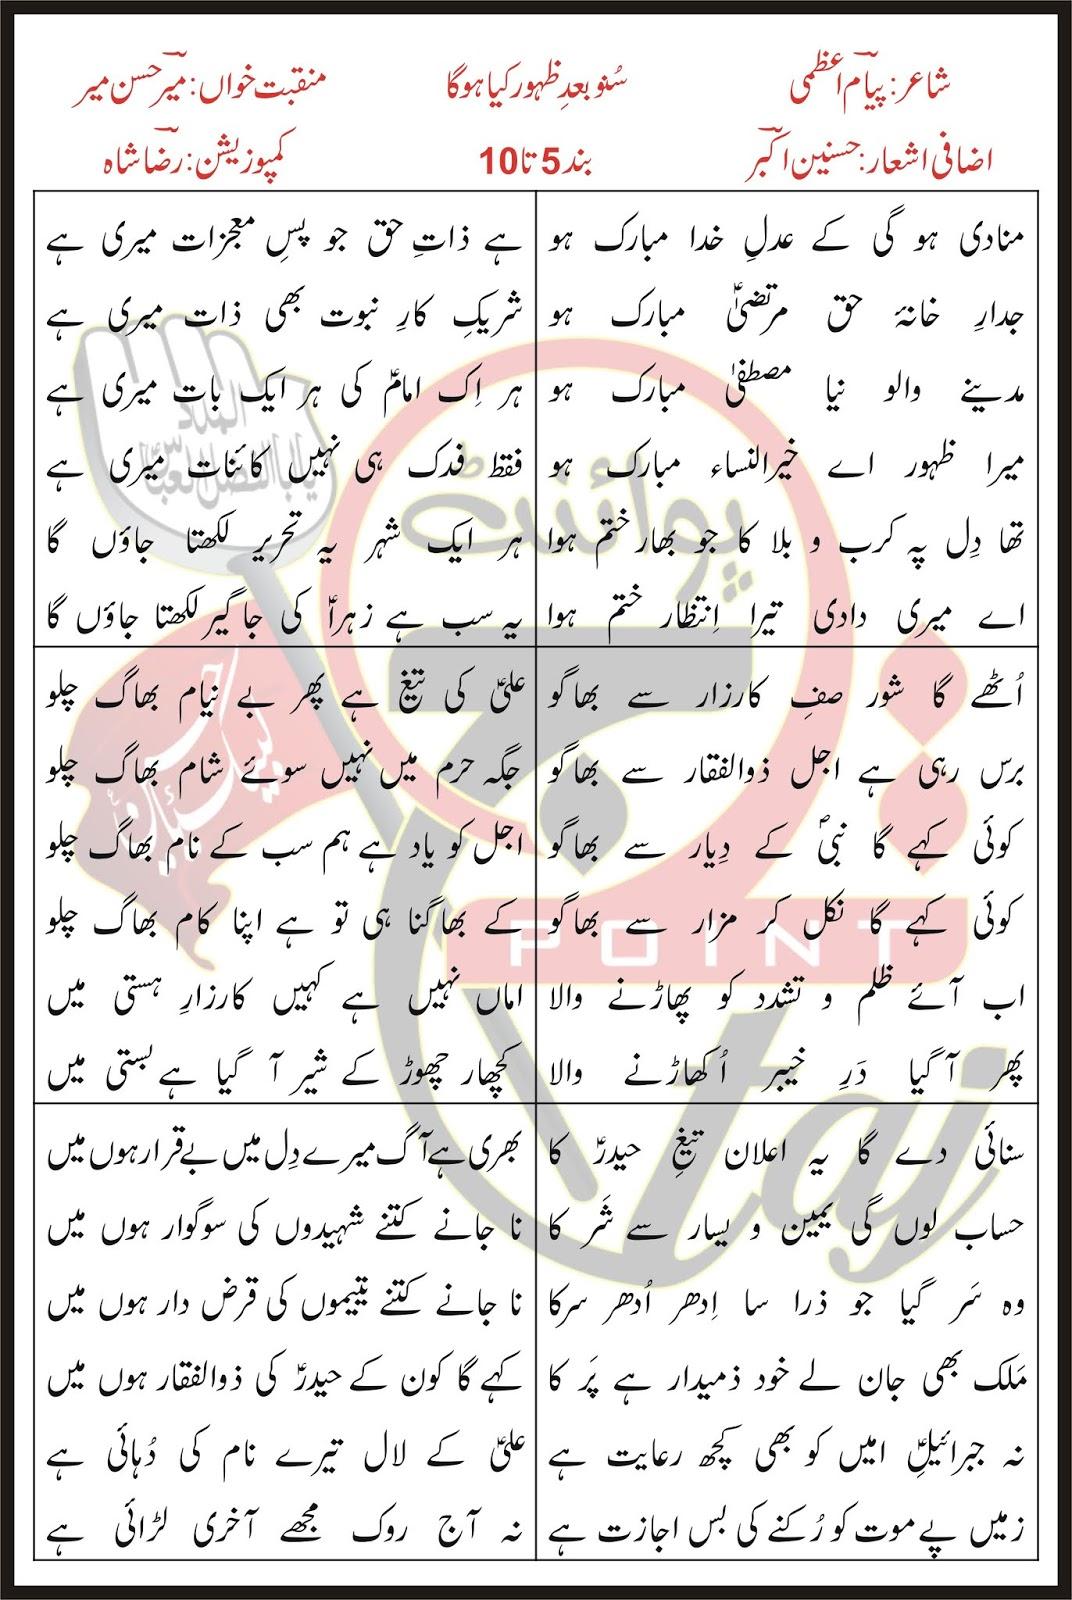 Suno Bad-e-Zahoor Kya Ho Ga 5-10 Lyrics In Urdu and Roman Urdu